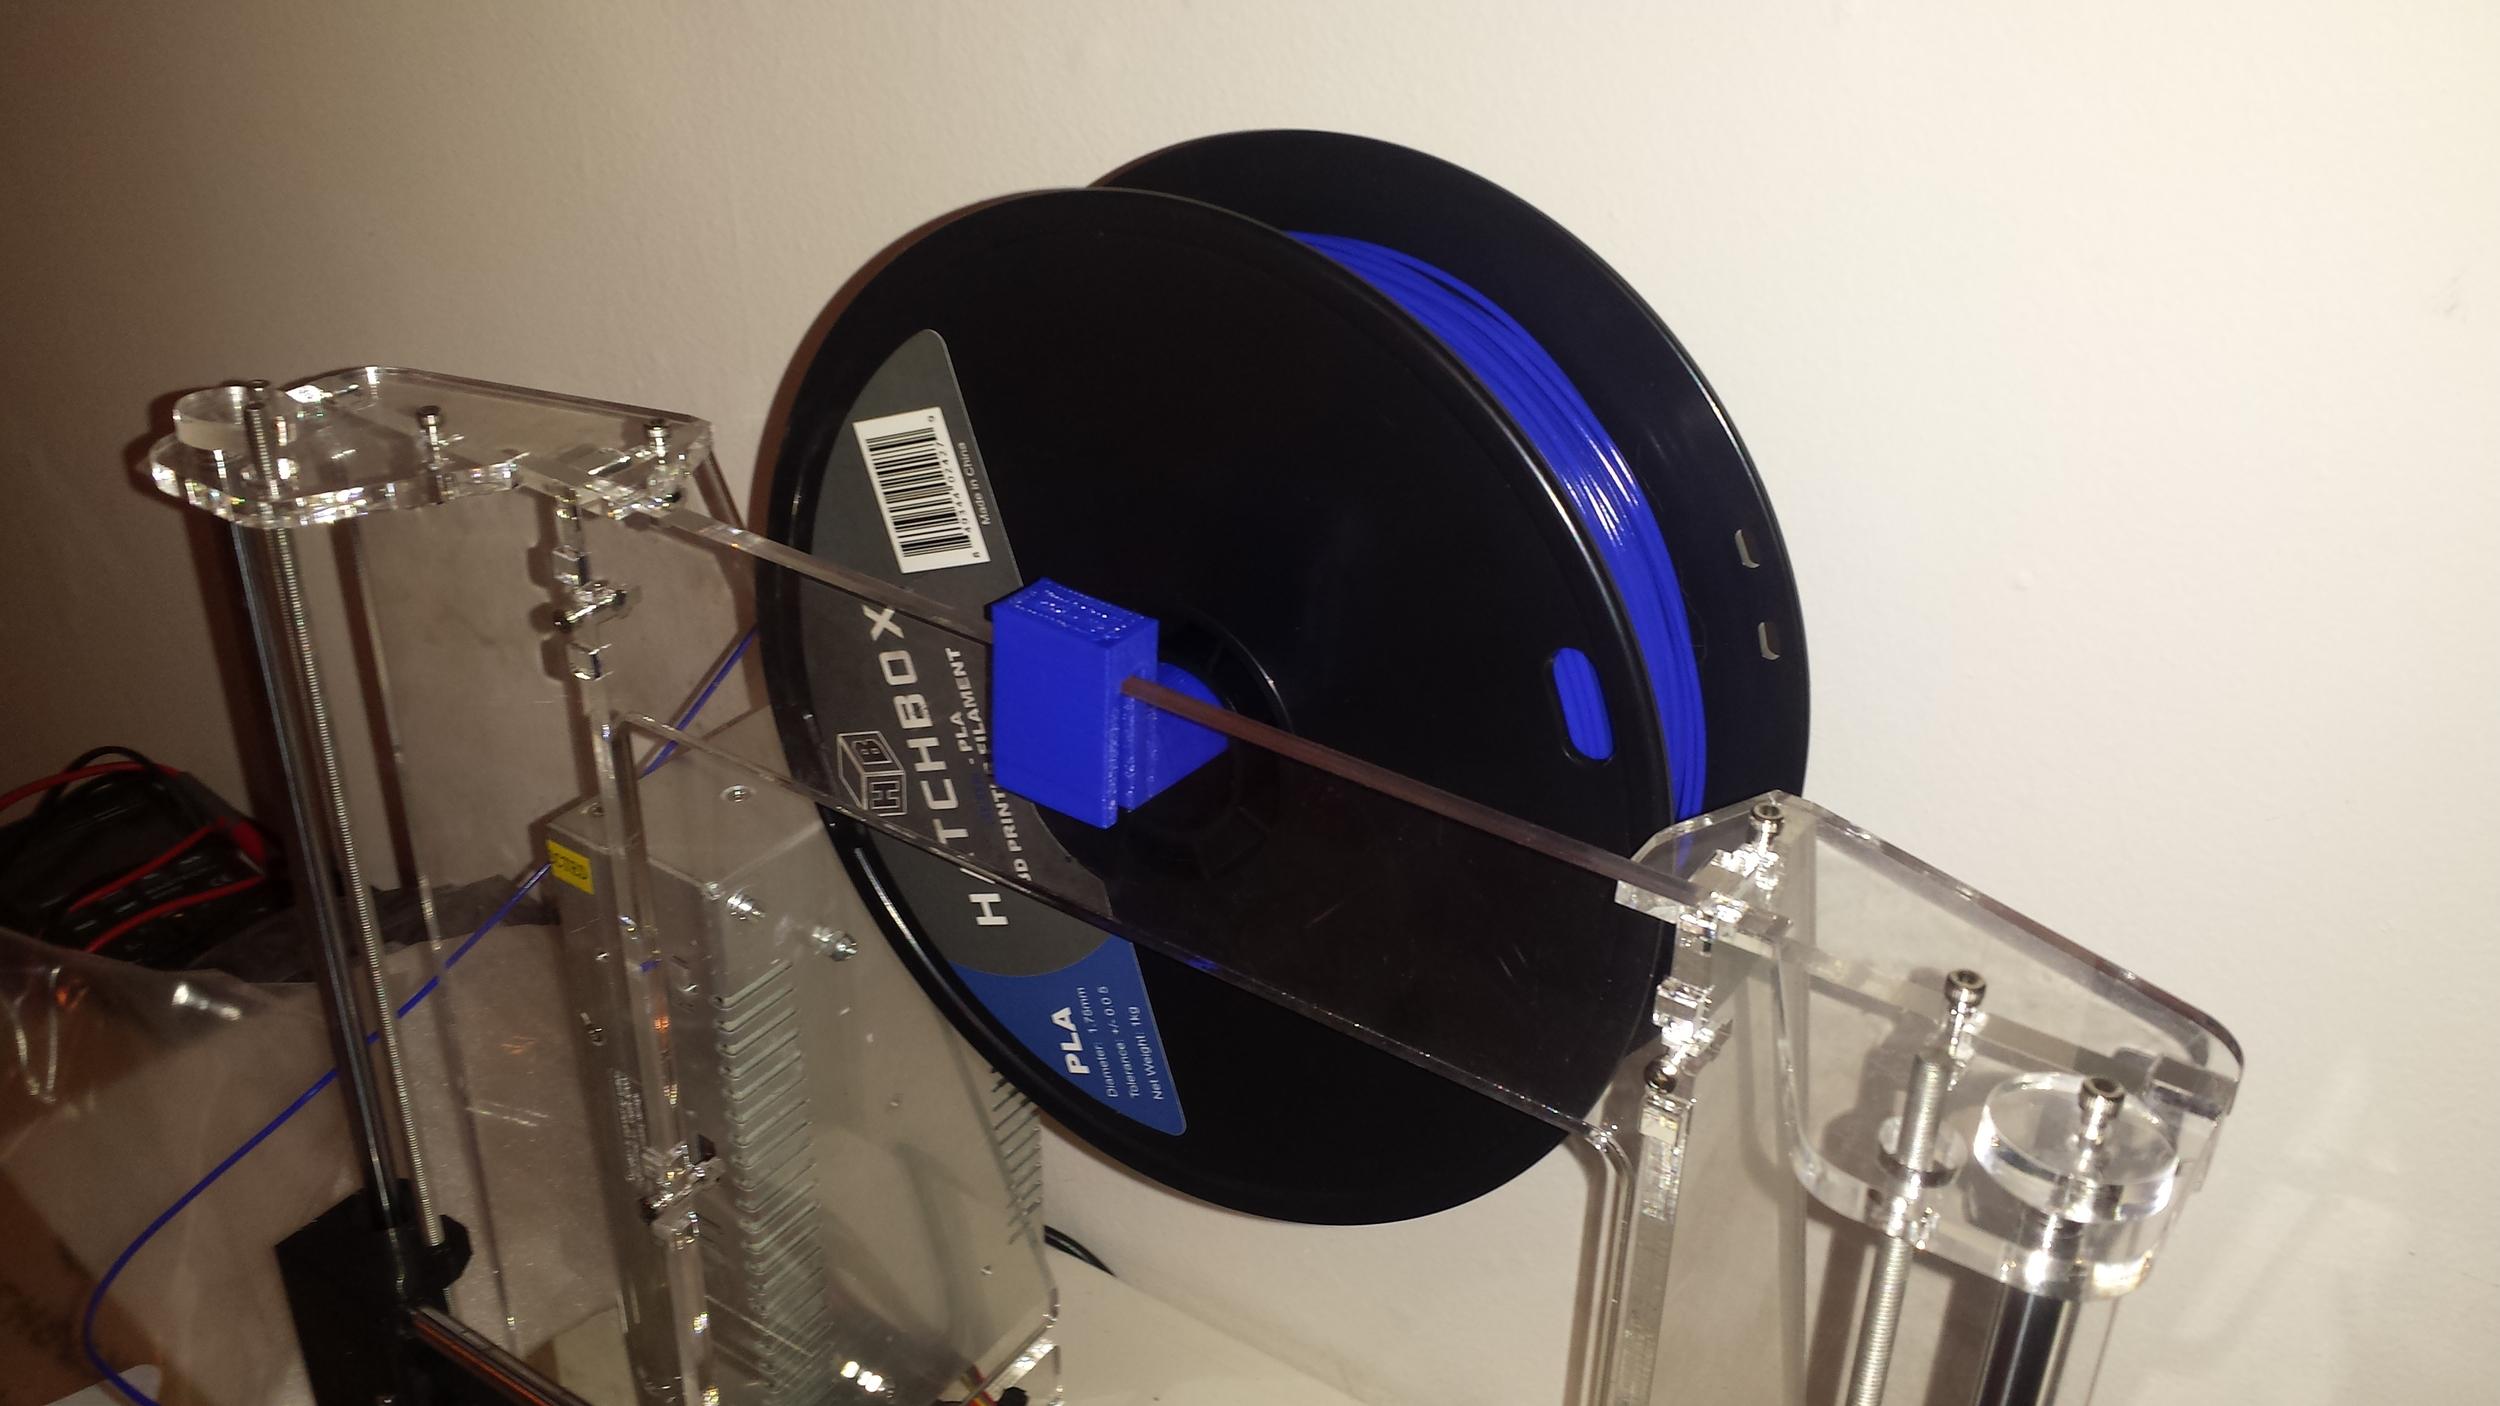 Filament Spool Holder - Mounted